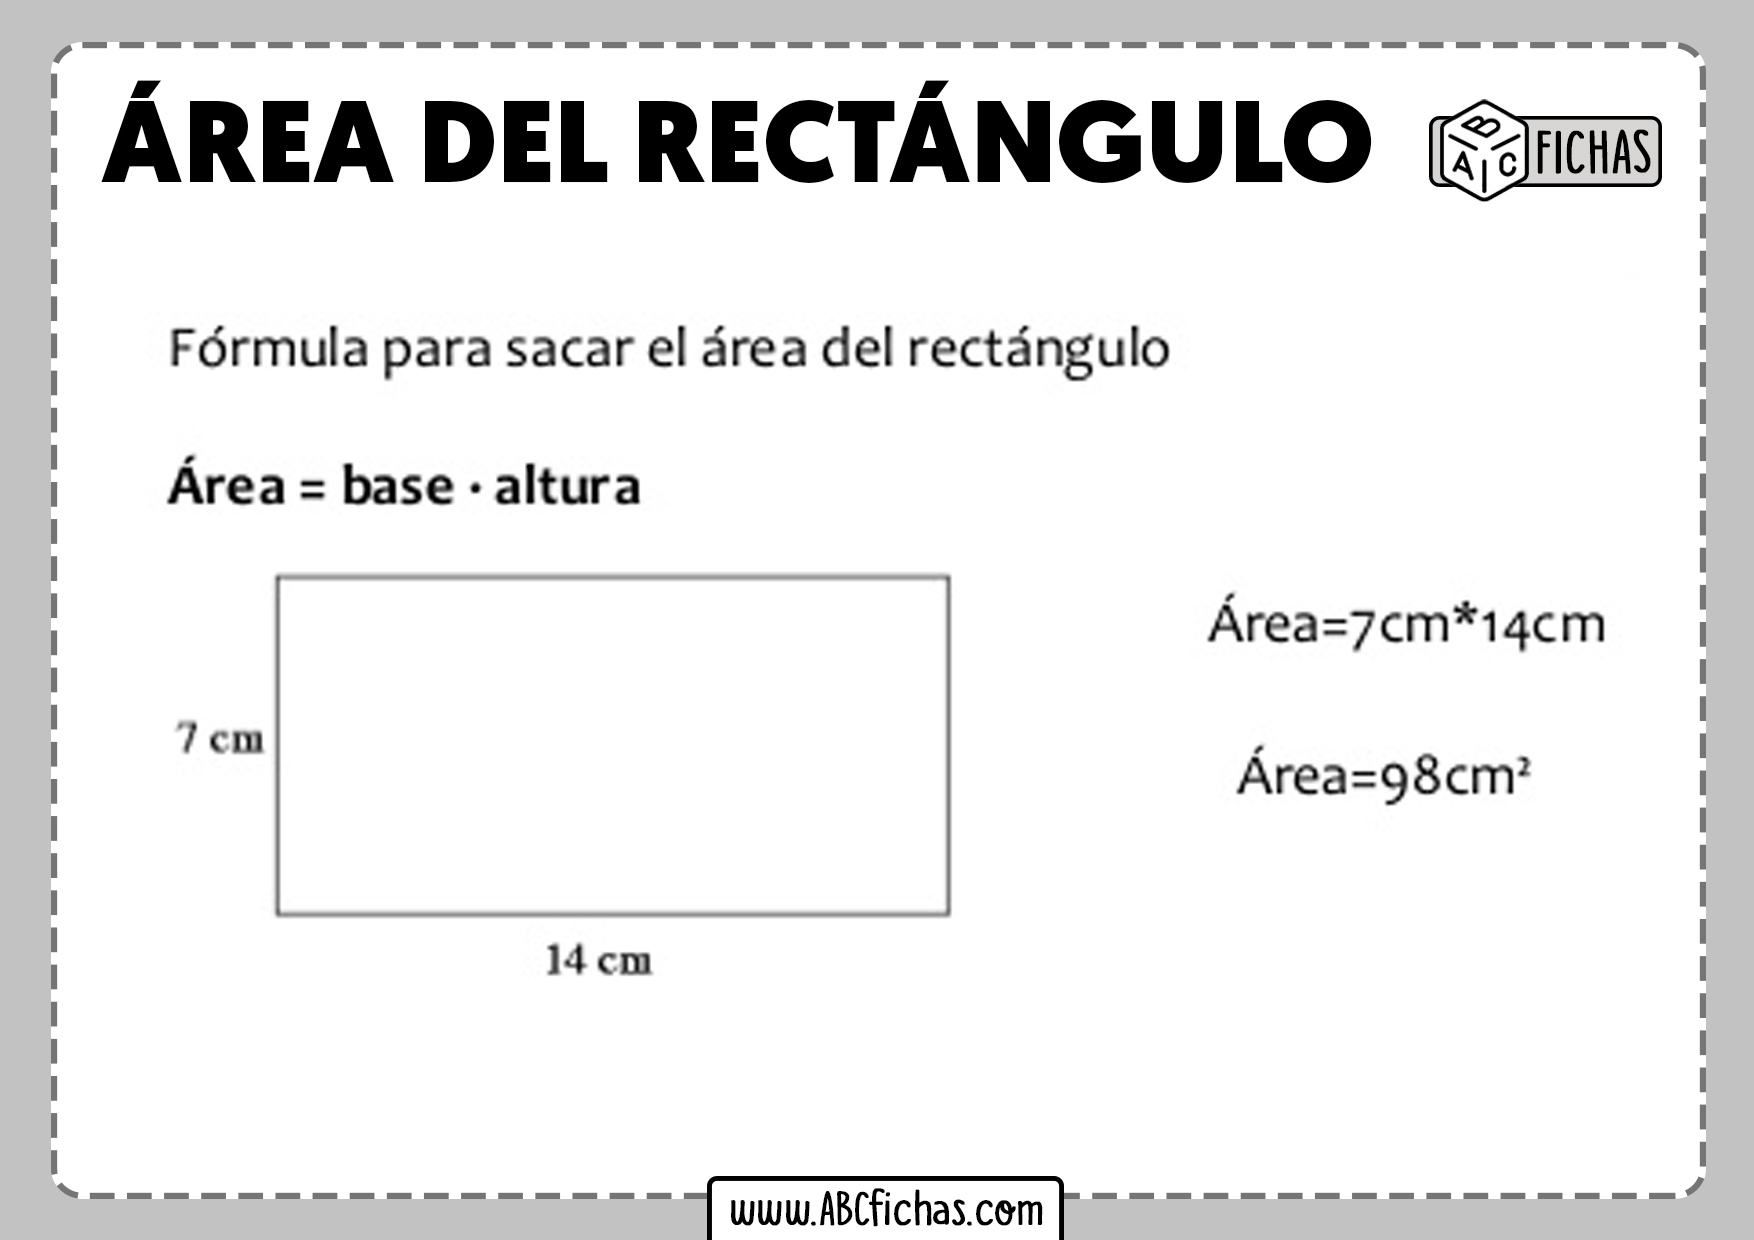 Area del rectangulo formula